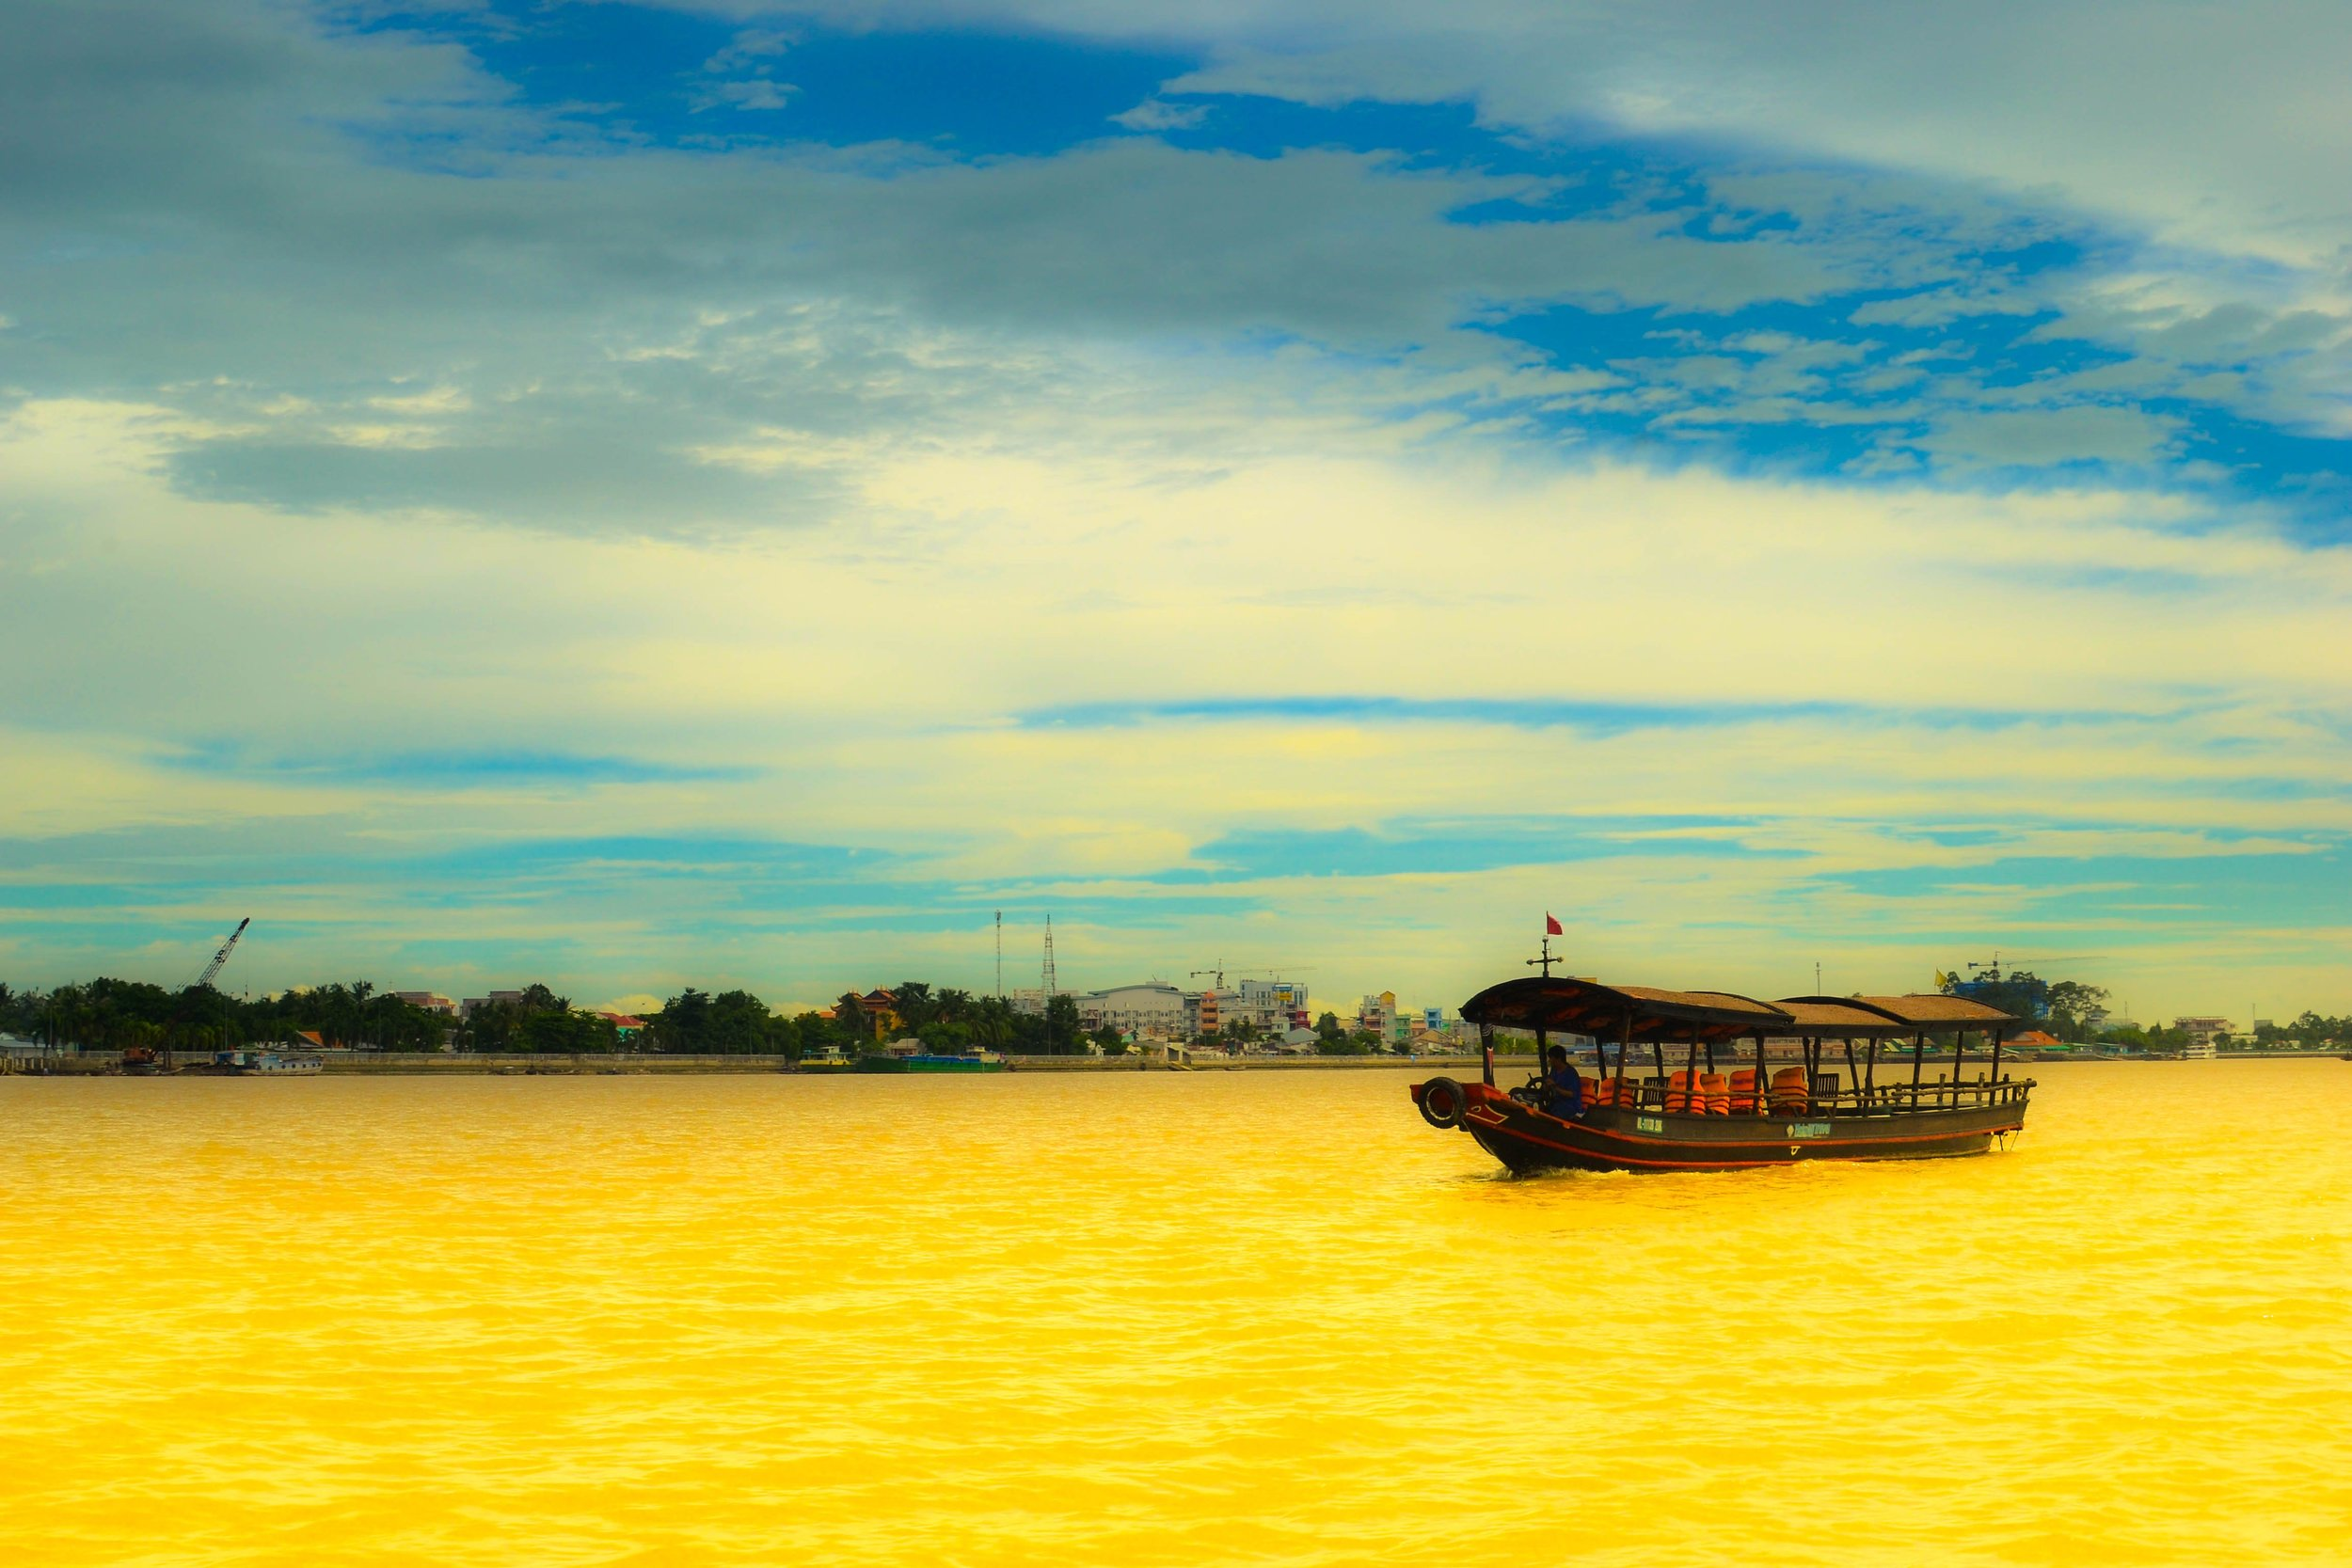 boat-city-color-188008.jpg